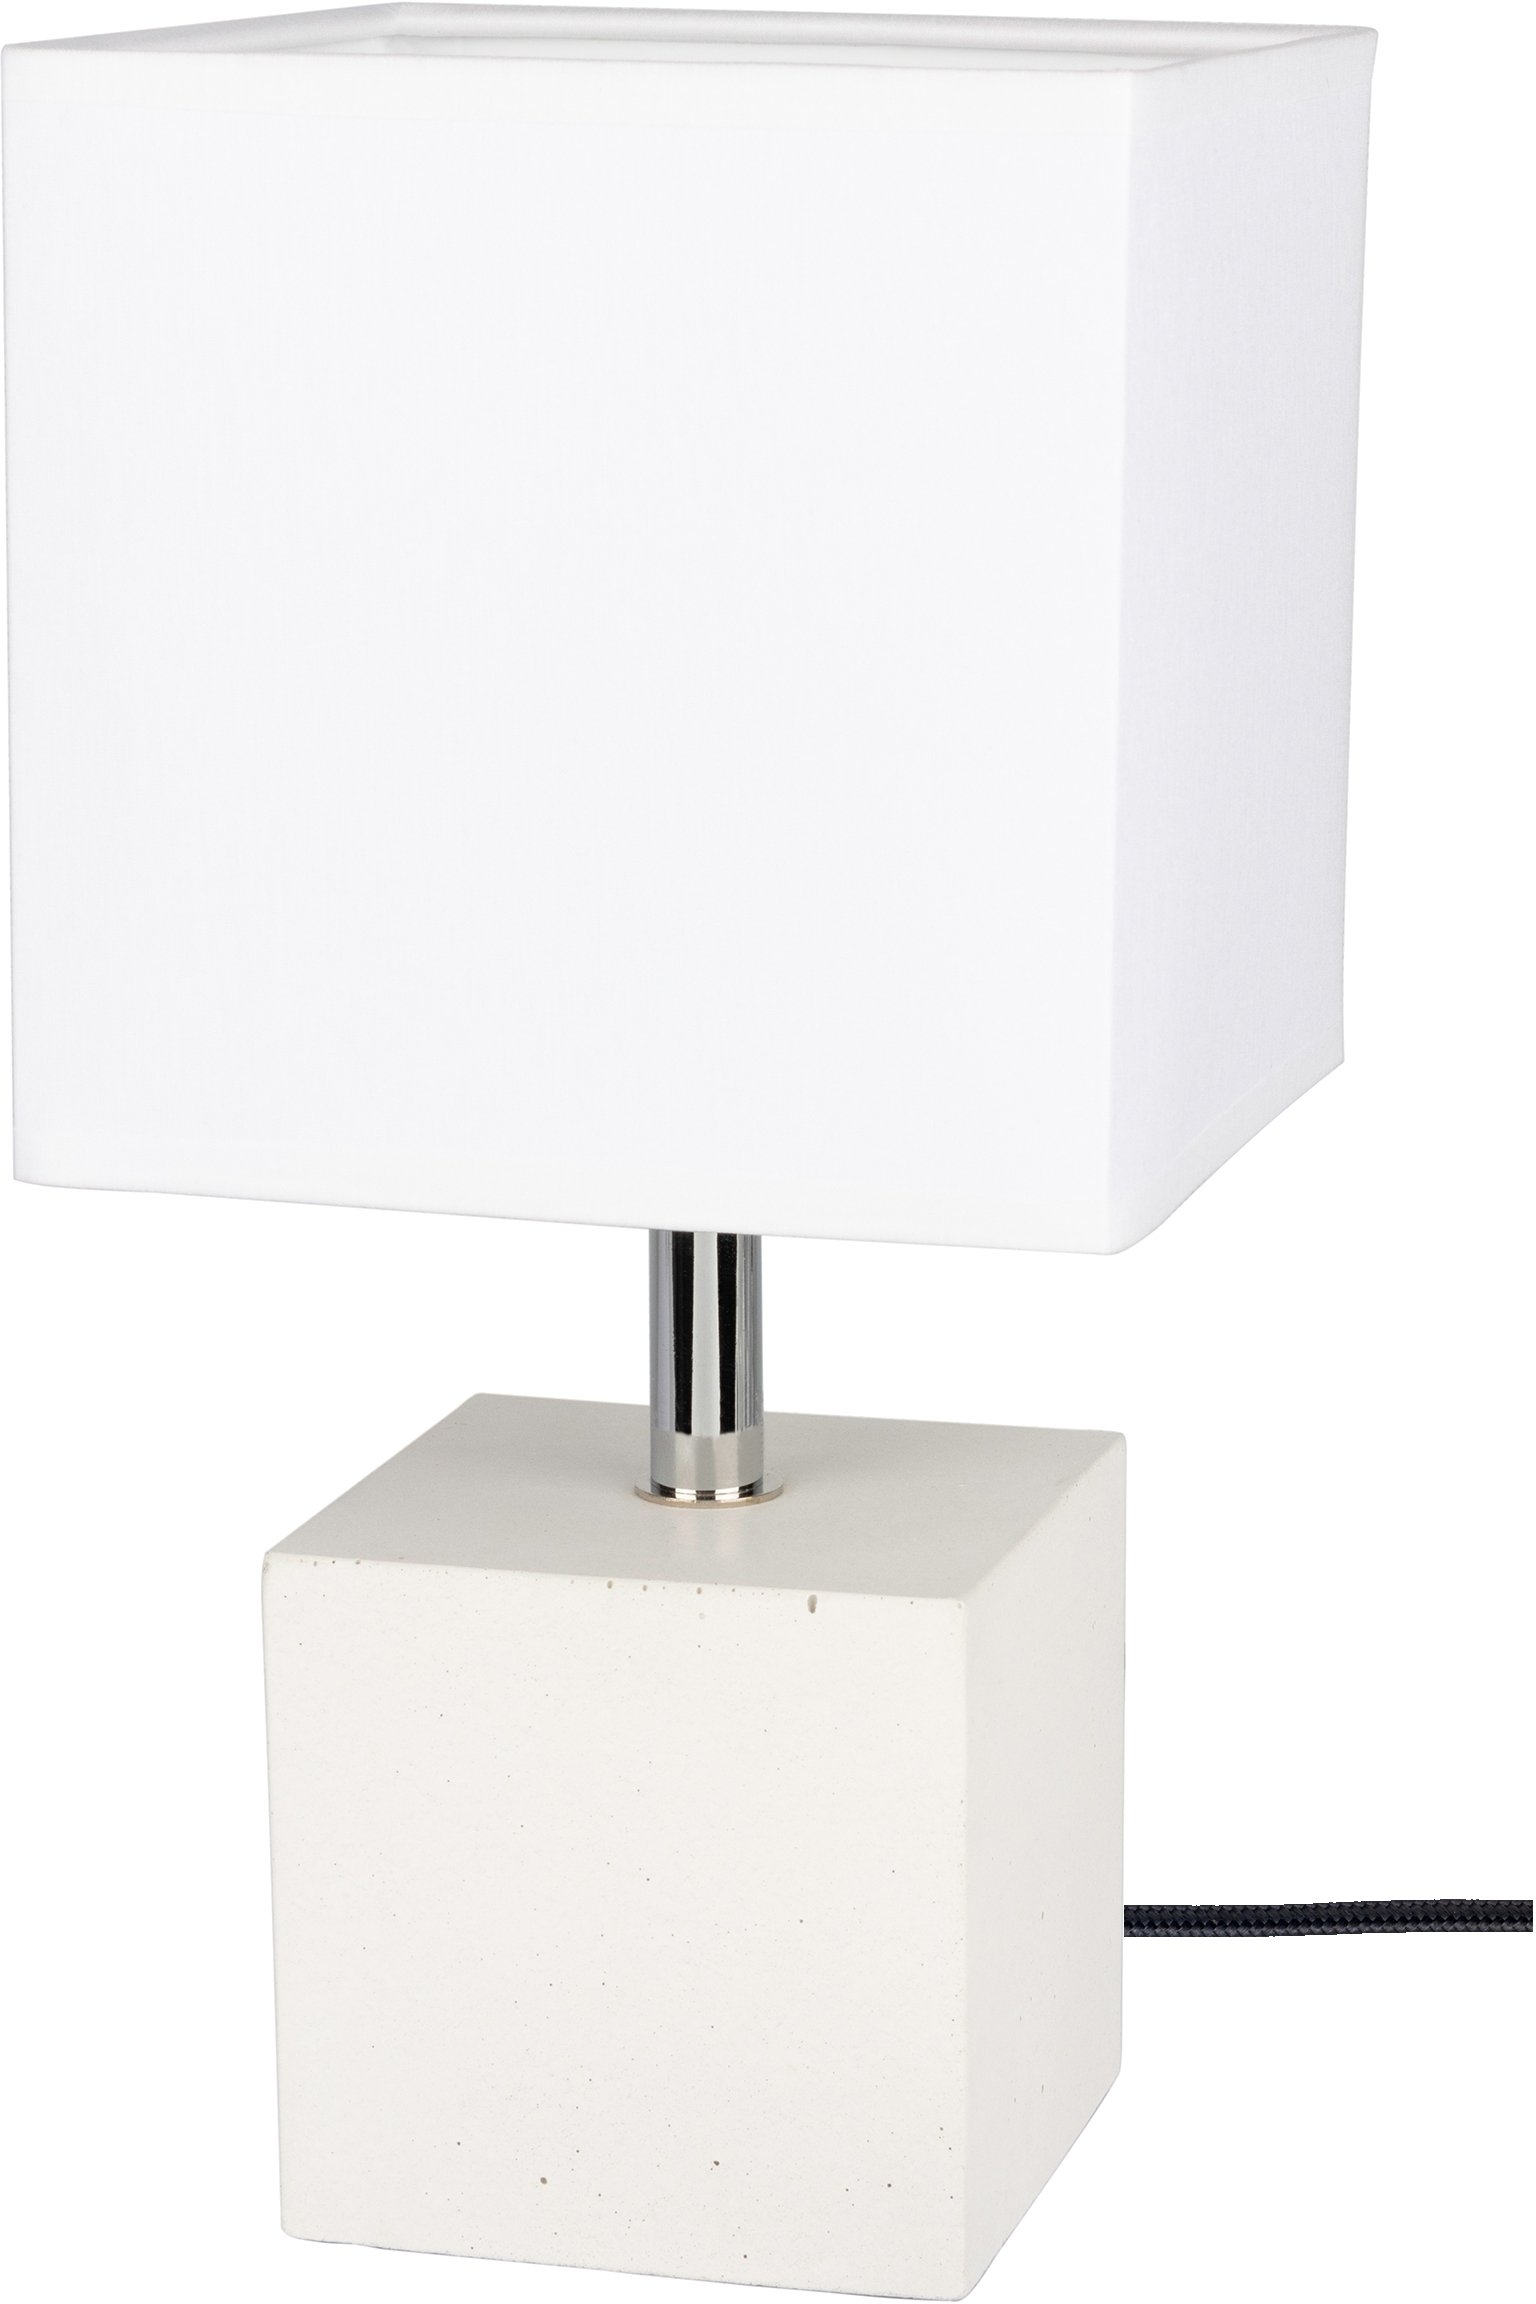 SPOT Light Tafellamp Strong Basis van wit beton, textielen kap, natuurproduct - duurzaam, Made in EU (1 stuk) bij OTTO online kopen